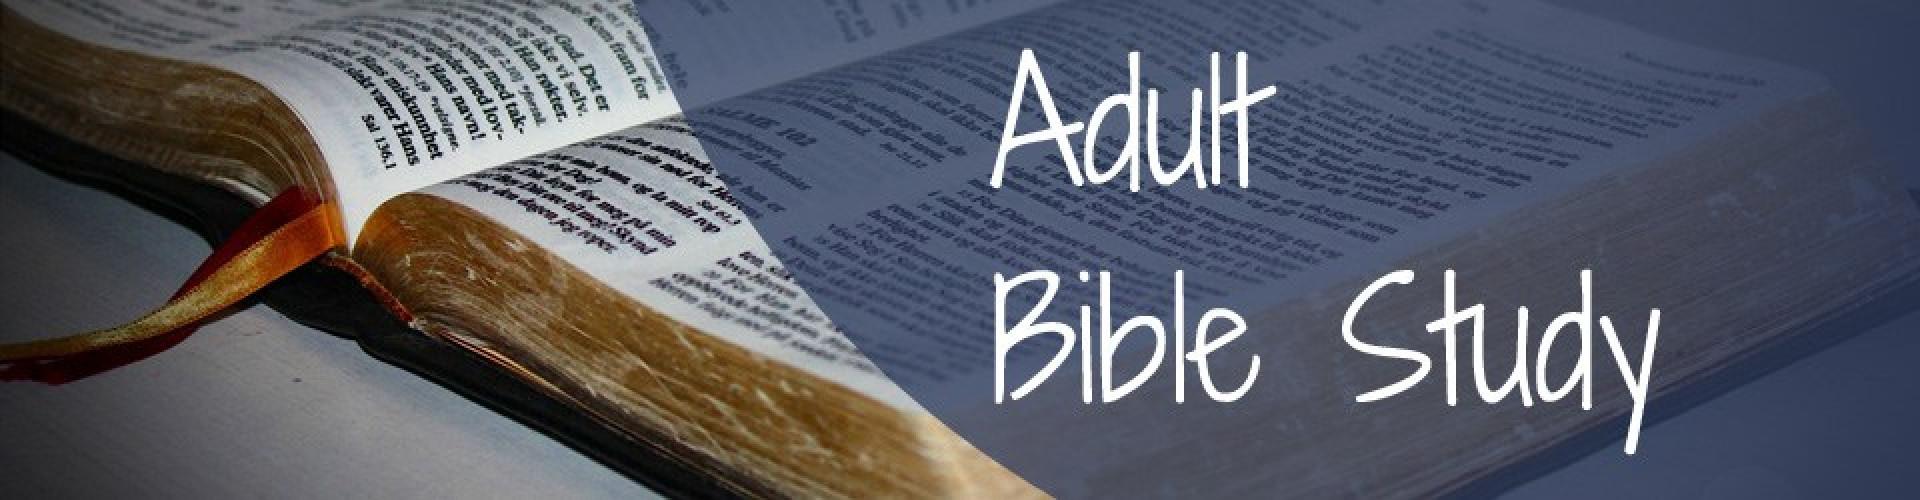 women-free-adult-bible-study-pics